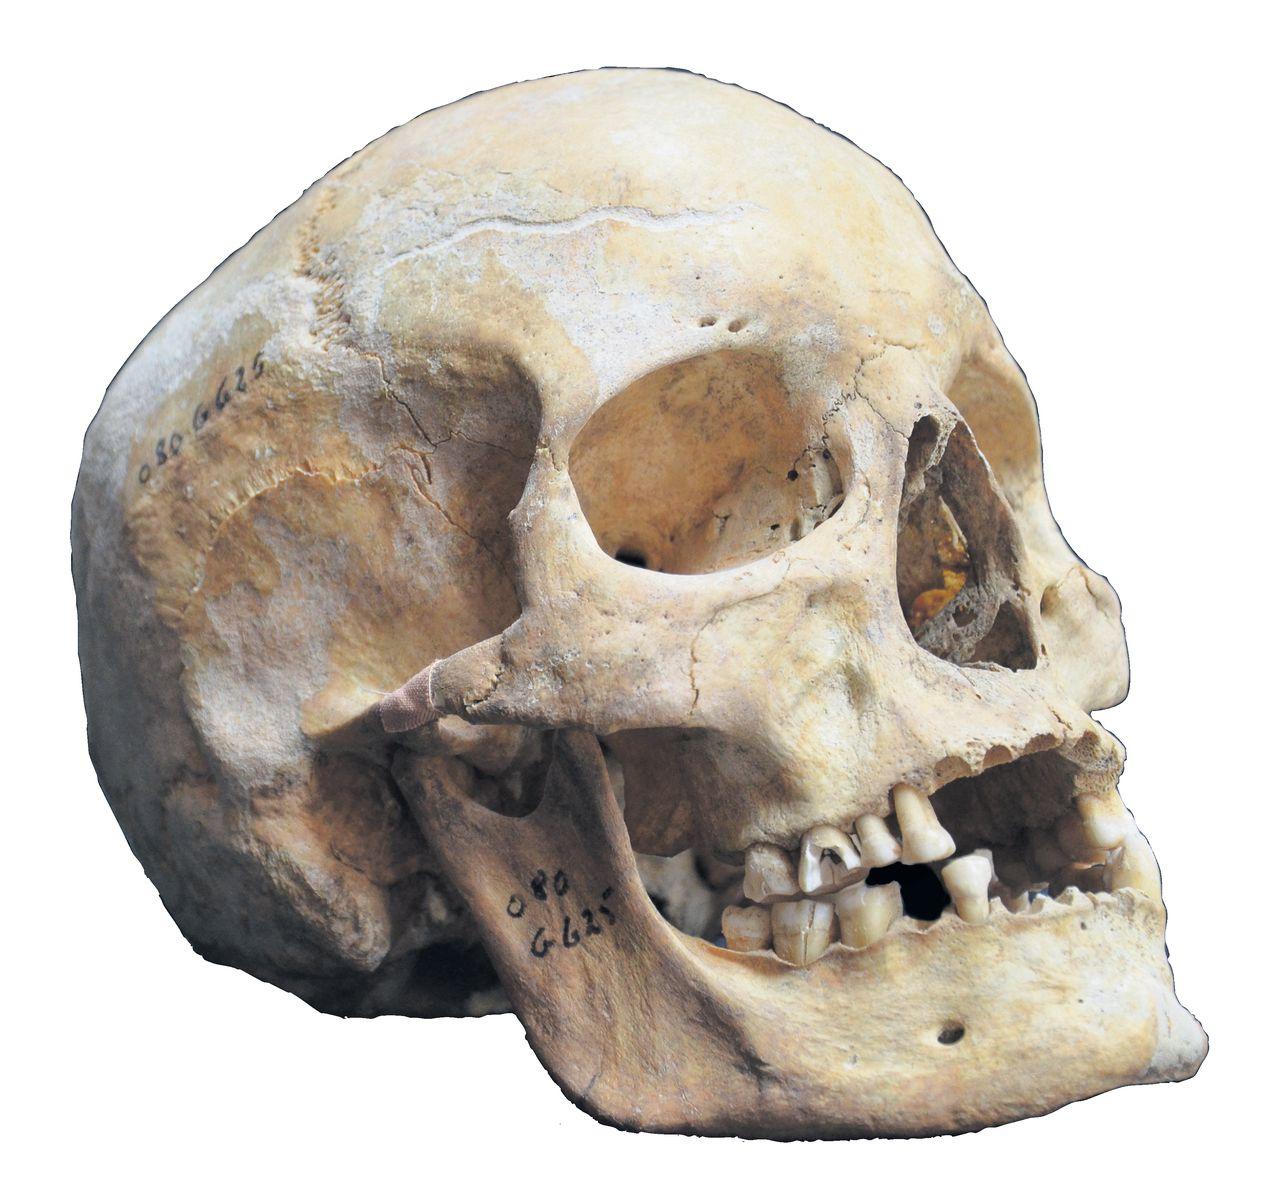 Deense leprapatiënt Jorge 625.